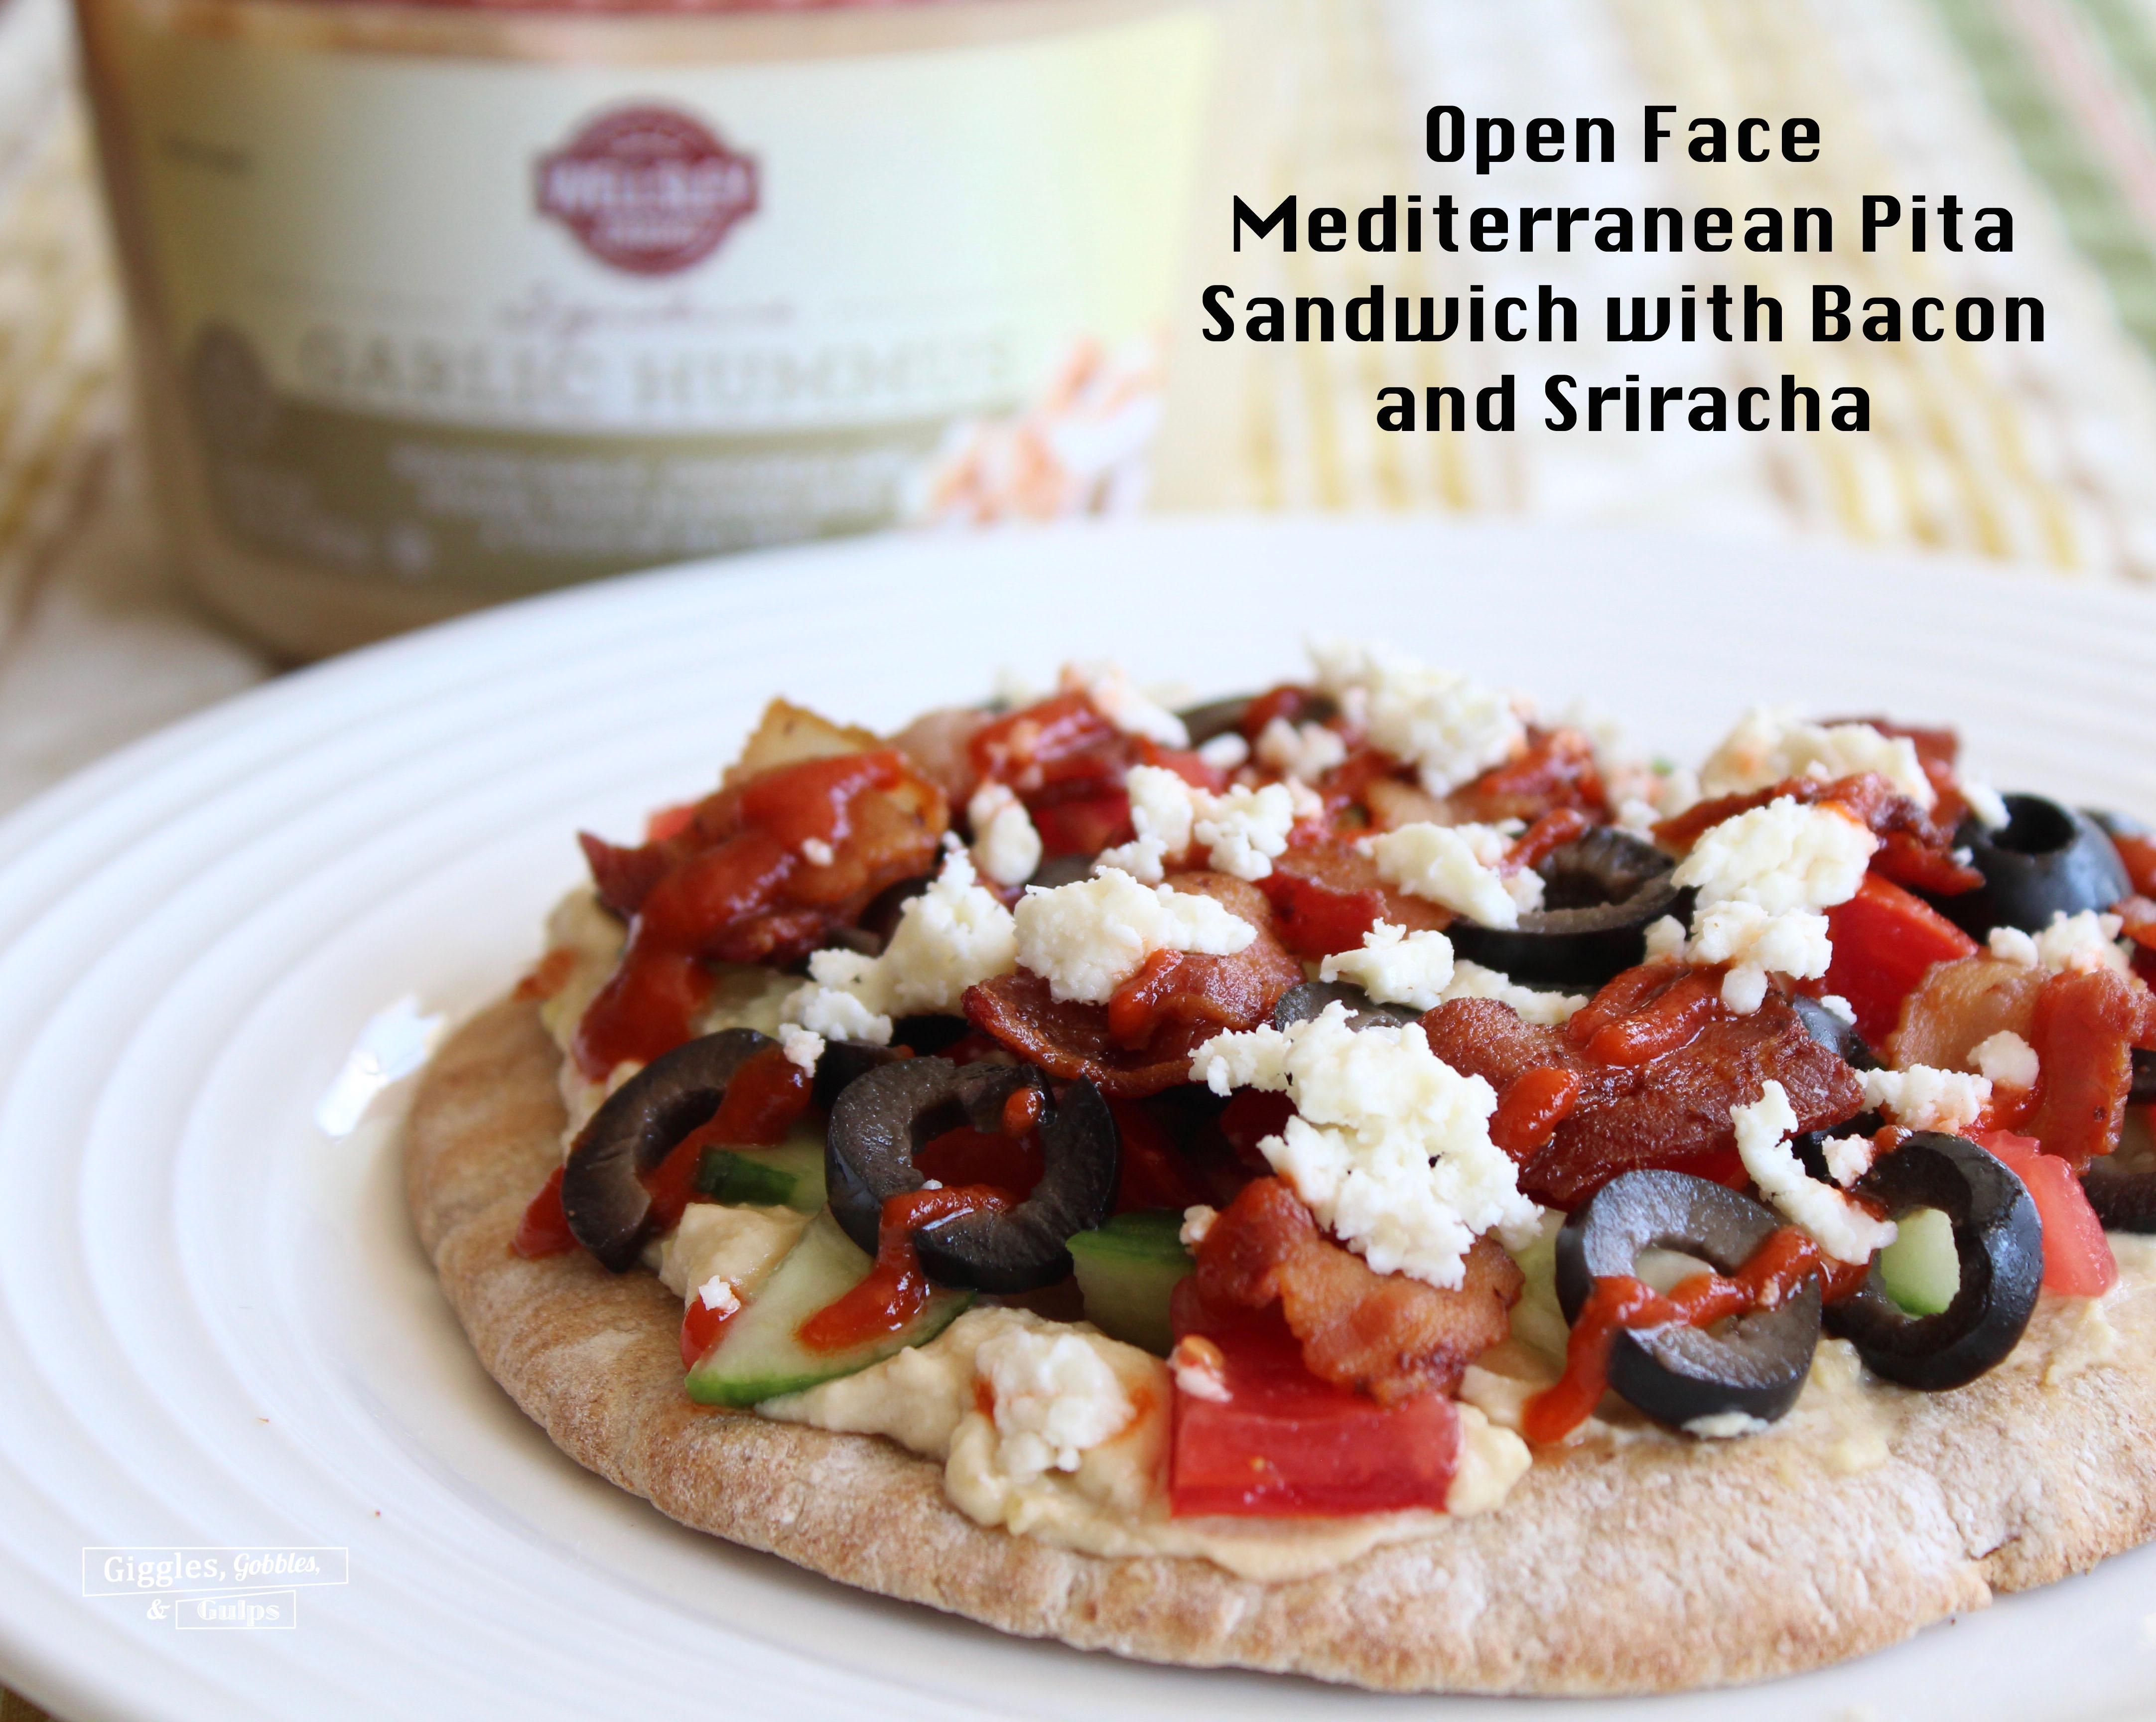 Open Face Mediterranean Pita Sandwich